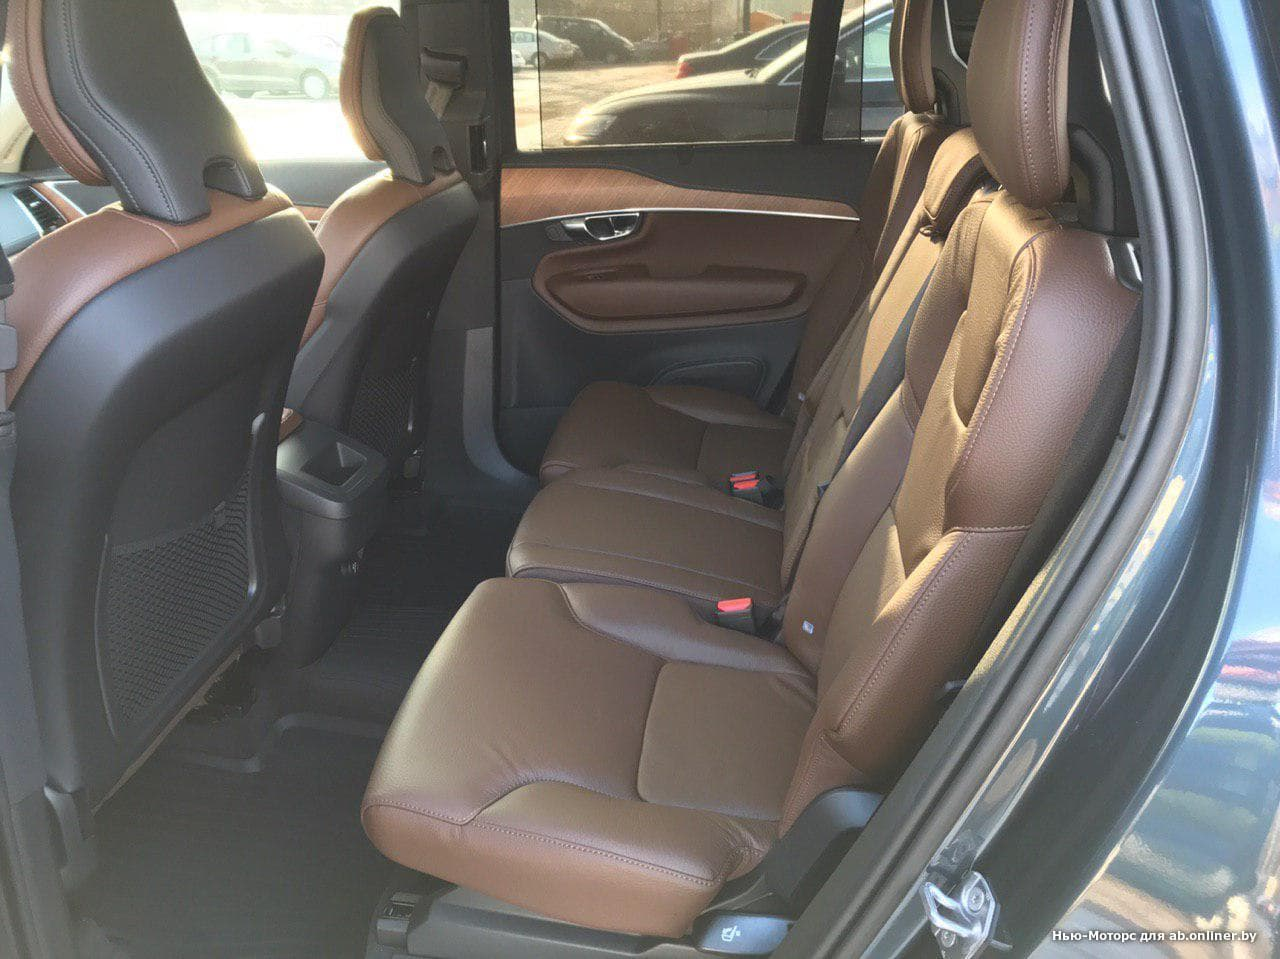 Volvo XC90 Inscription D5 AWD Drive-E 235